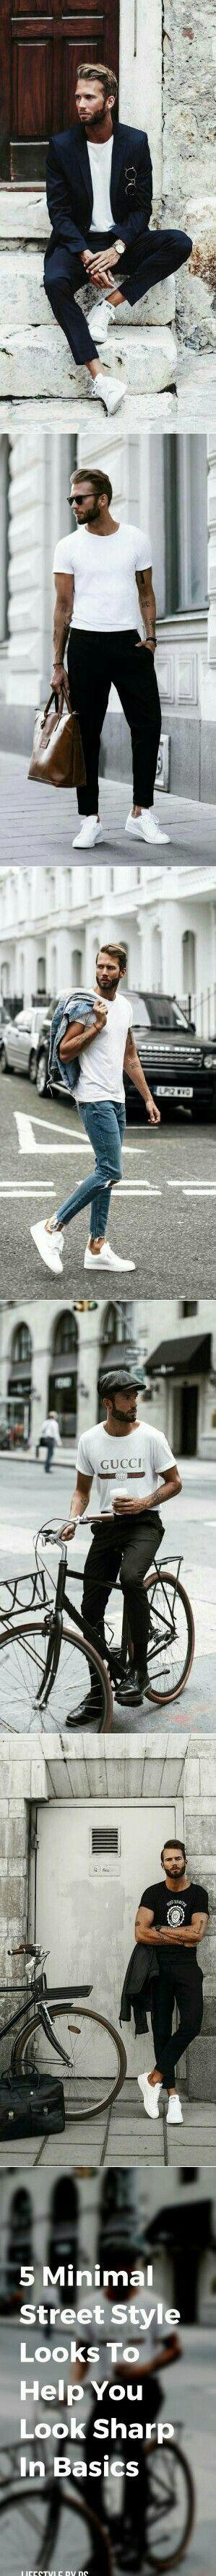 Awesome Minimal Street Style Inspiration. #mens #fashion